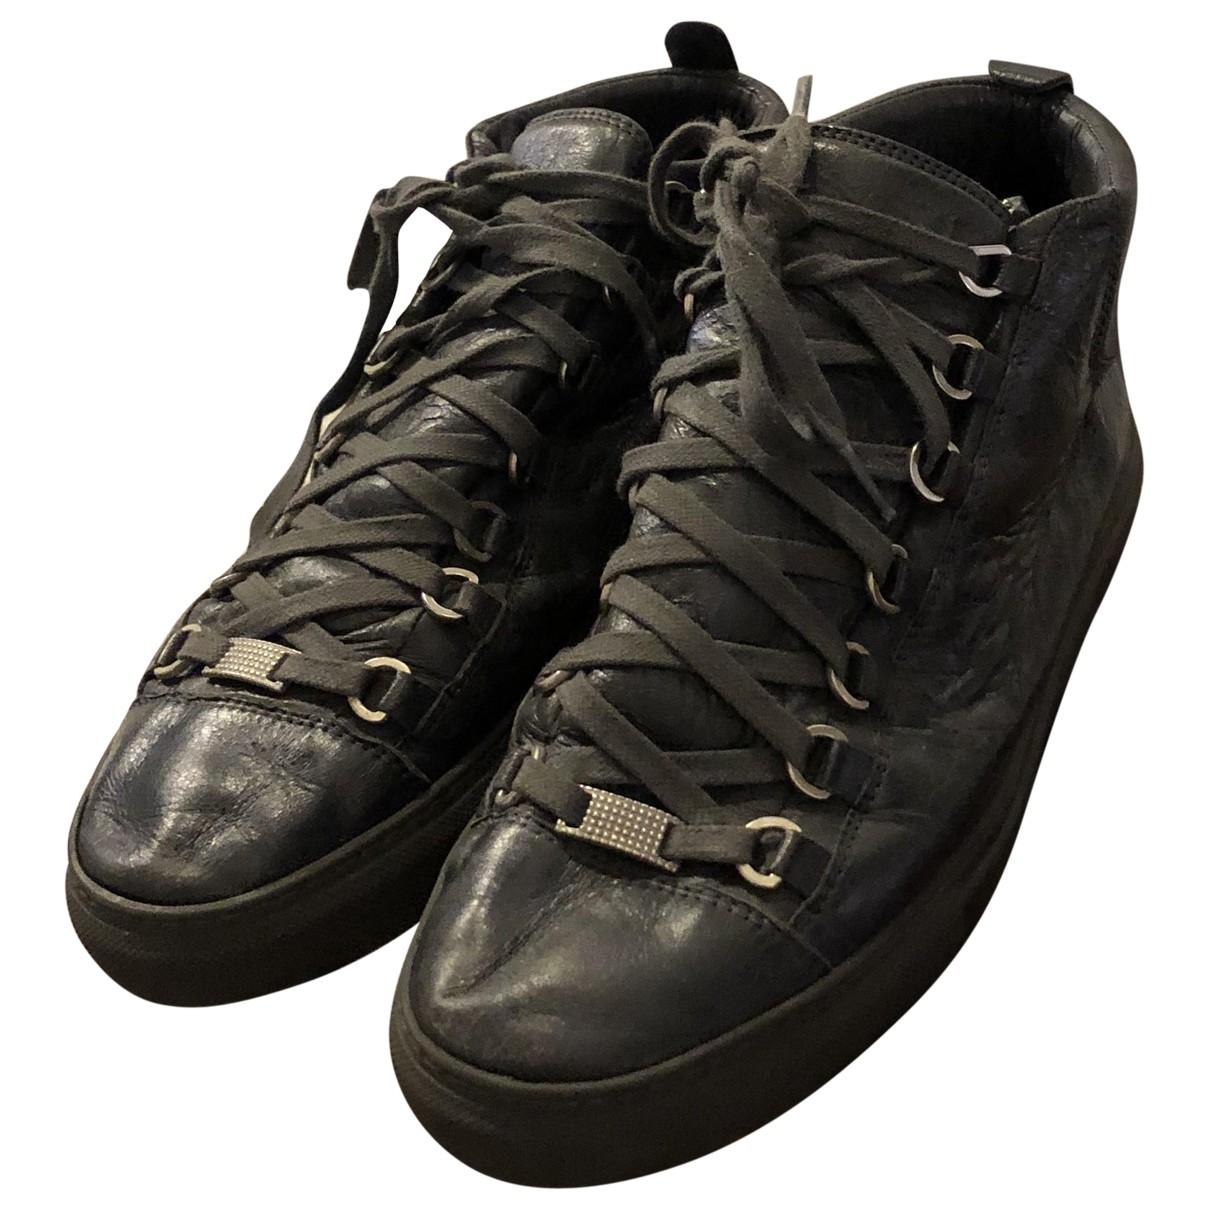 Balenciaga Arena Anthracite Leather Trainers for Women 40 EU